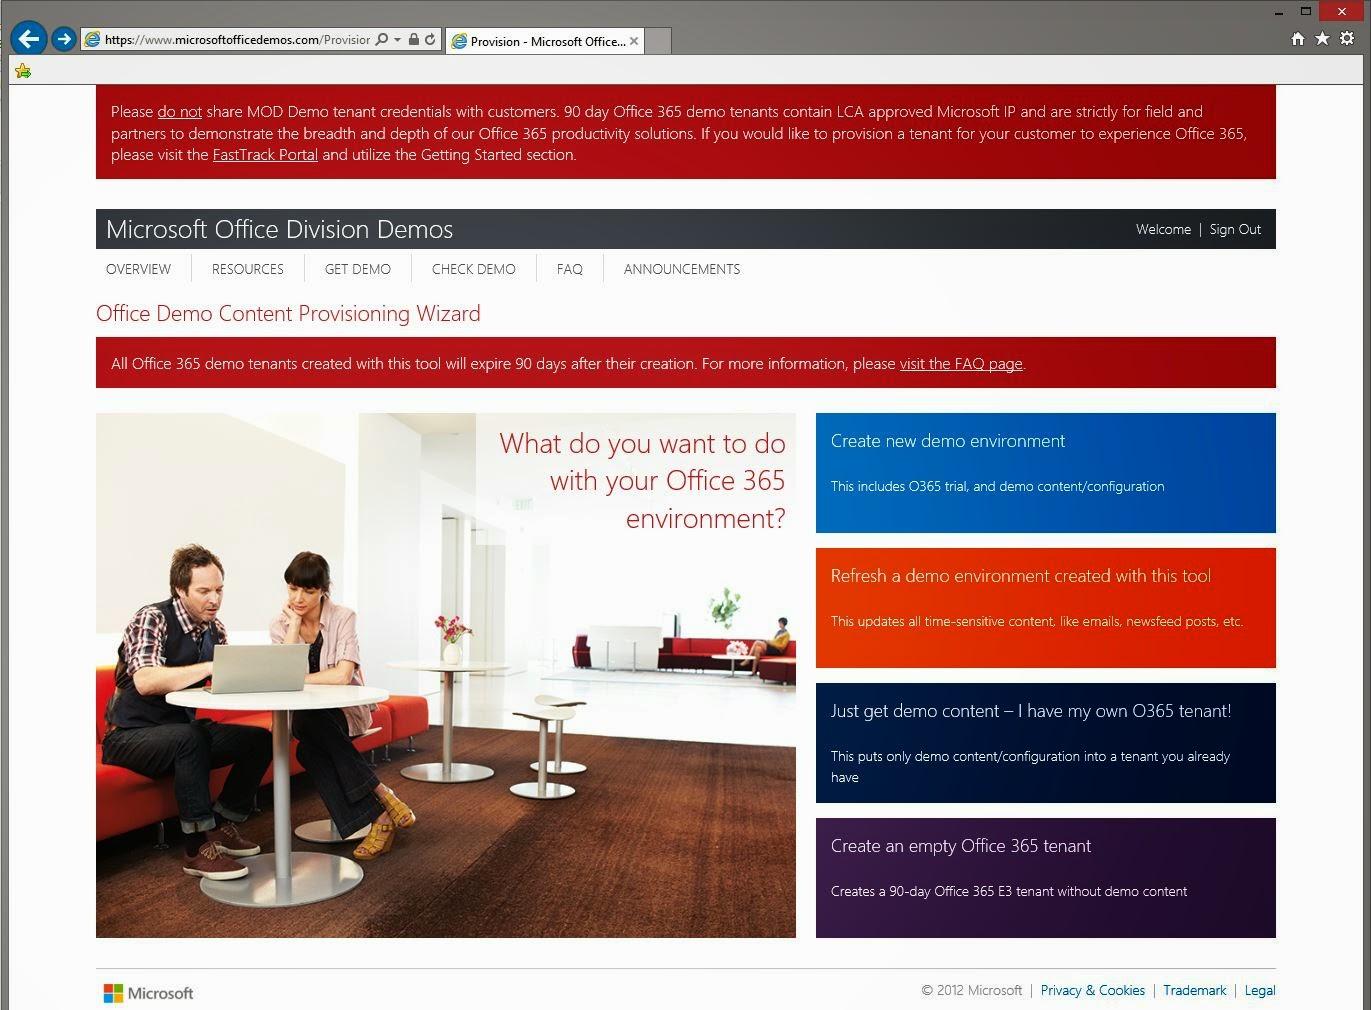 Microsoft Office Demo Tenant Options